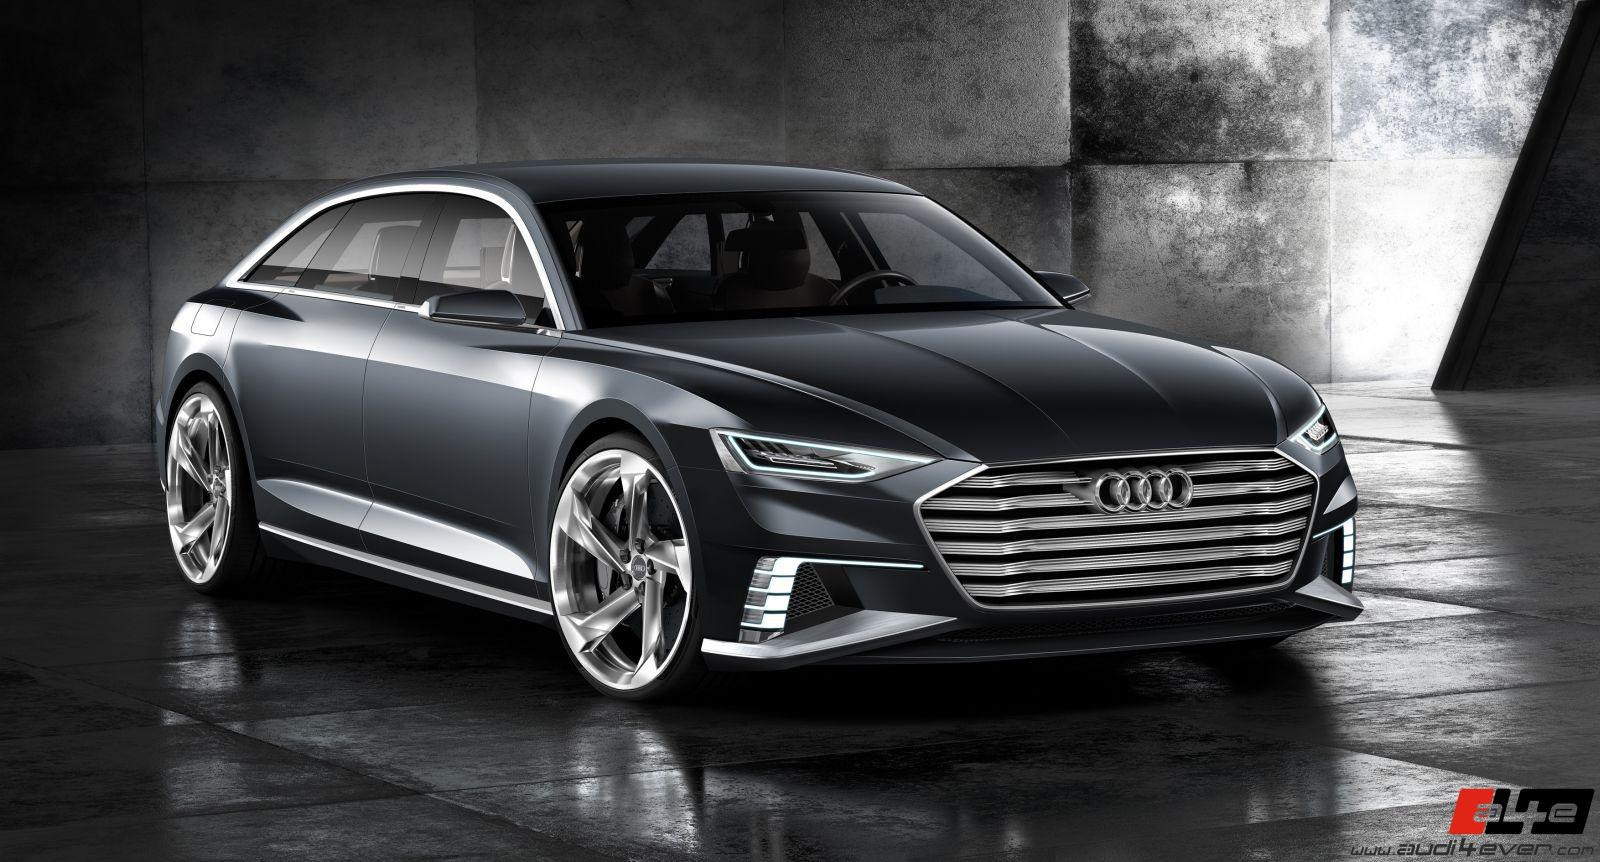 a4e - Gallery A... Audi Concept Cars 2015